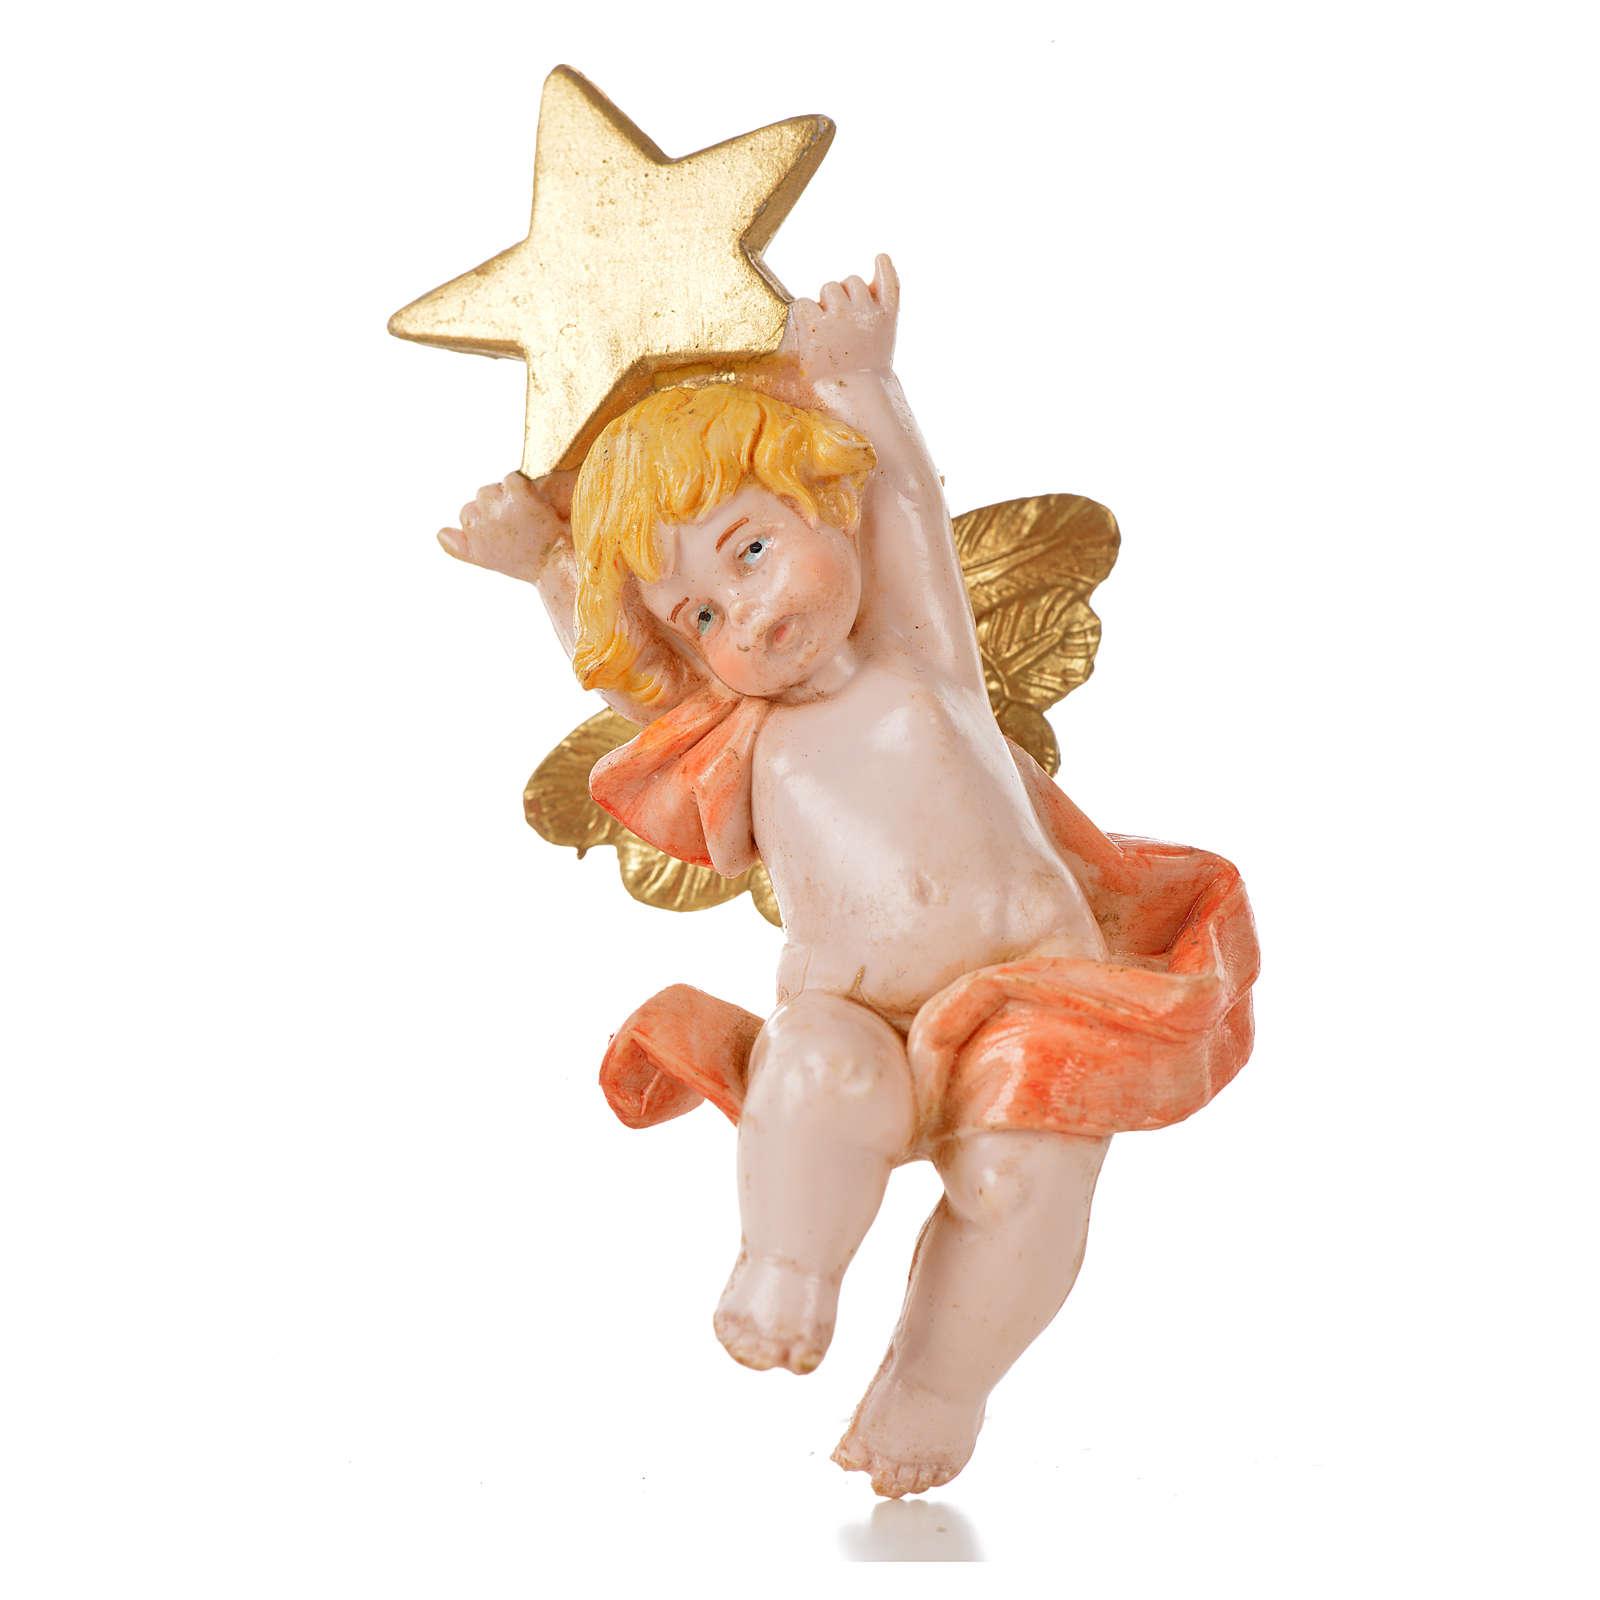 Ange rose étoile 7 cm Fontanini type porcelaine 3